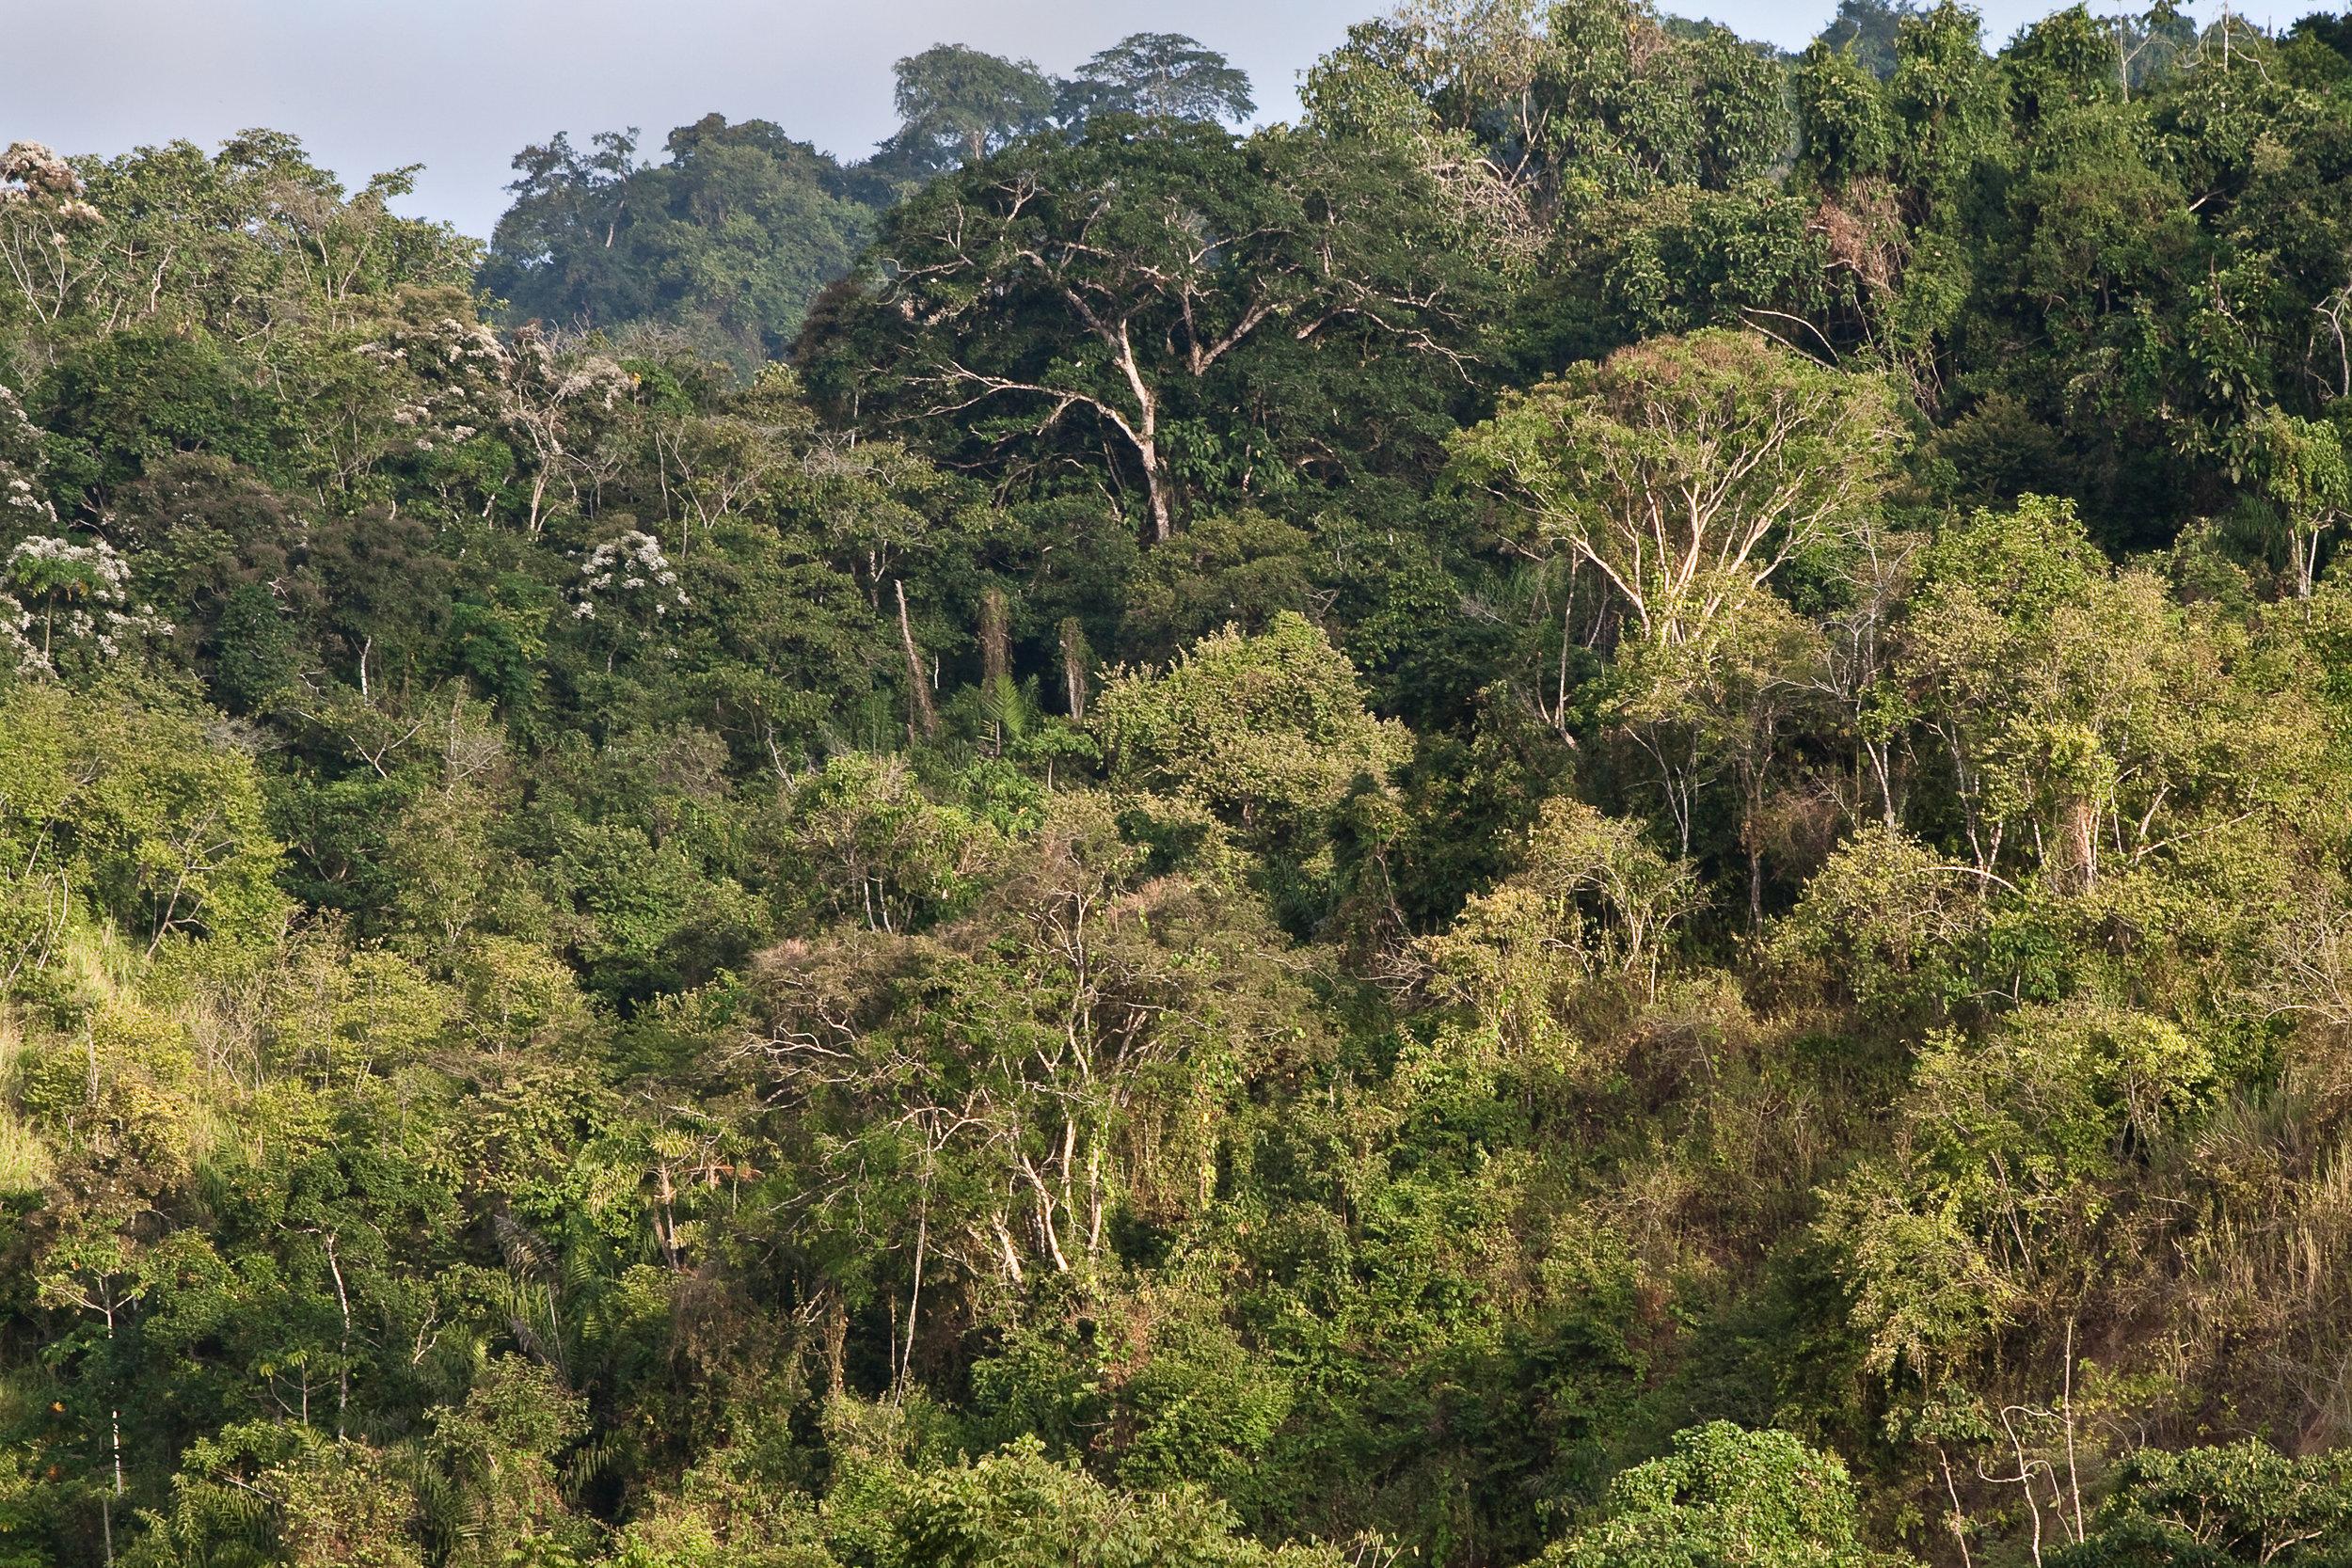 Beautiful-landscape-of-a-ceibo-tree-forest-in-Manabi,-Ecuador-475218298_2598x1732.jpeg